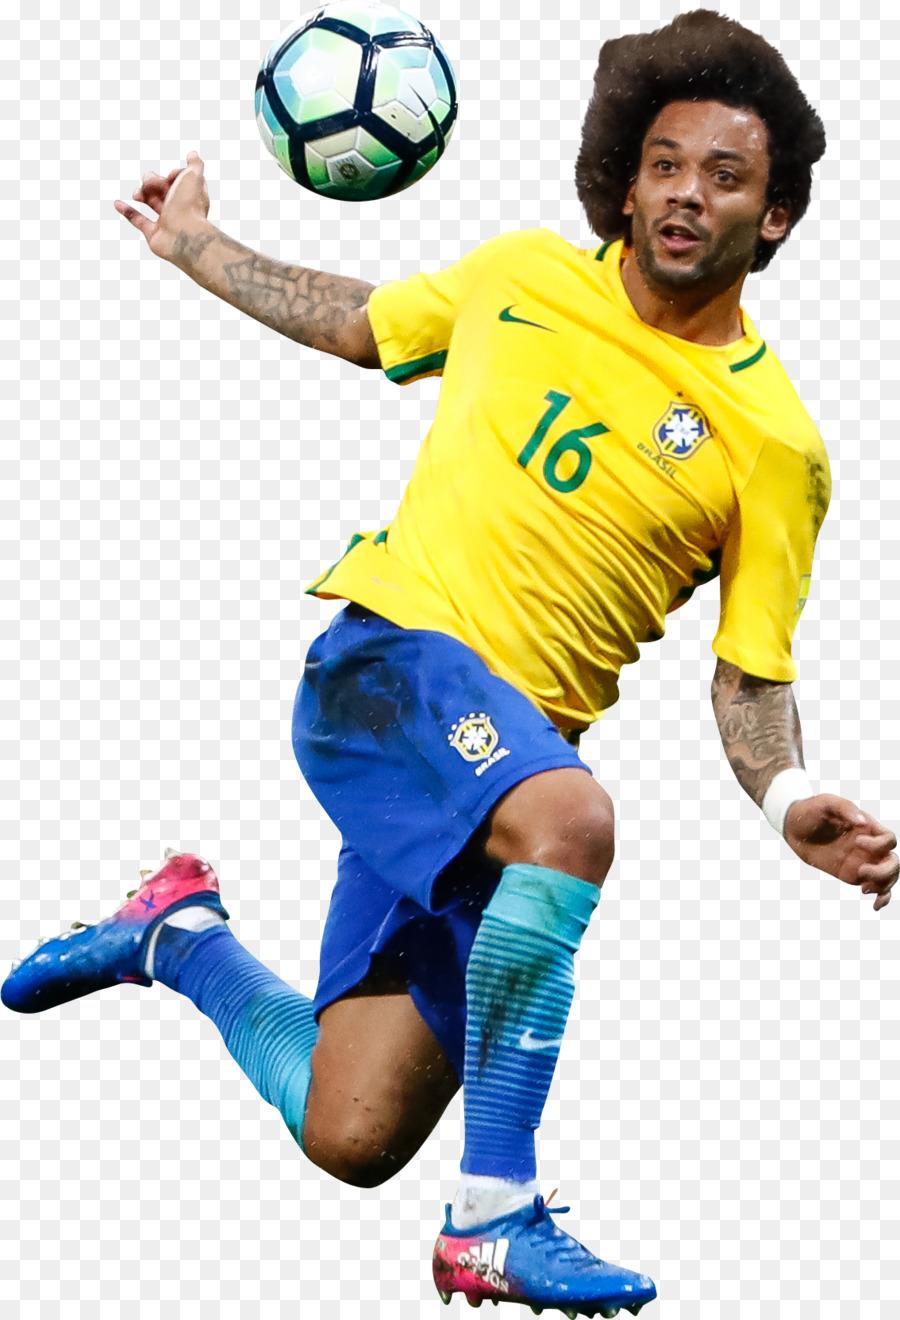 Descarga gratuita de Marcelo Vieira, El Equipo Nacional De Fútbol De Brasil, Fútbol Imágen de Png